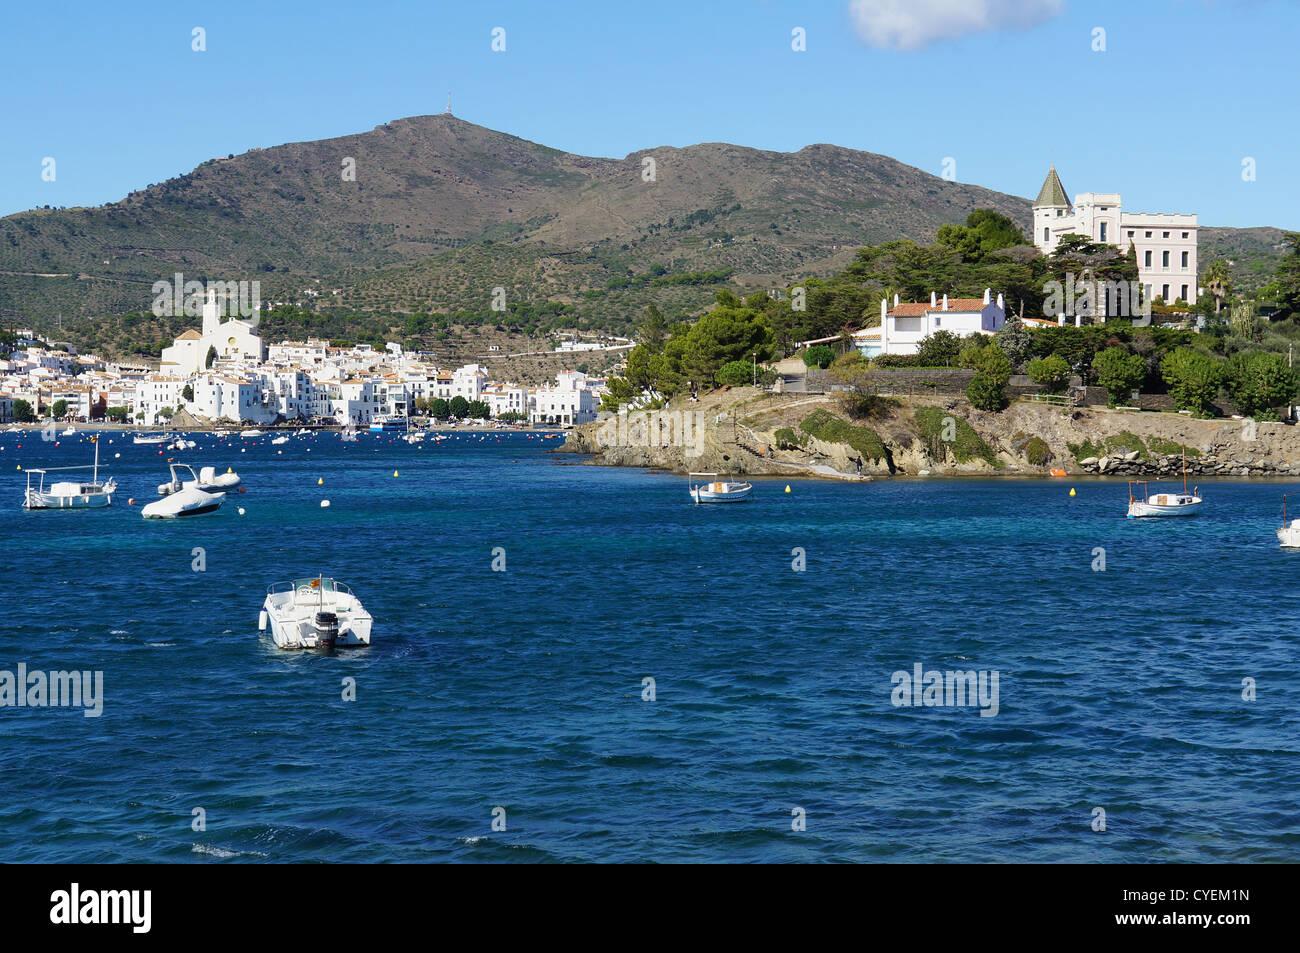 Mediterranean village of Cadaques, Catalonia, Costa Brava, Spain - Stock Image